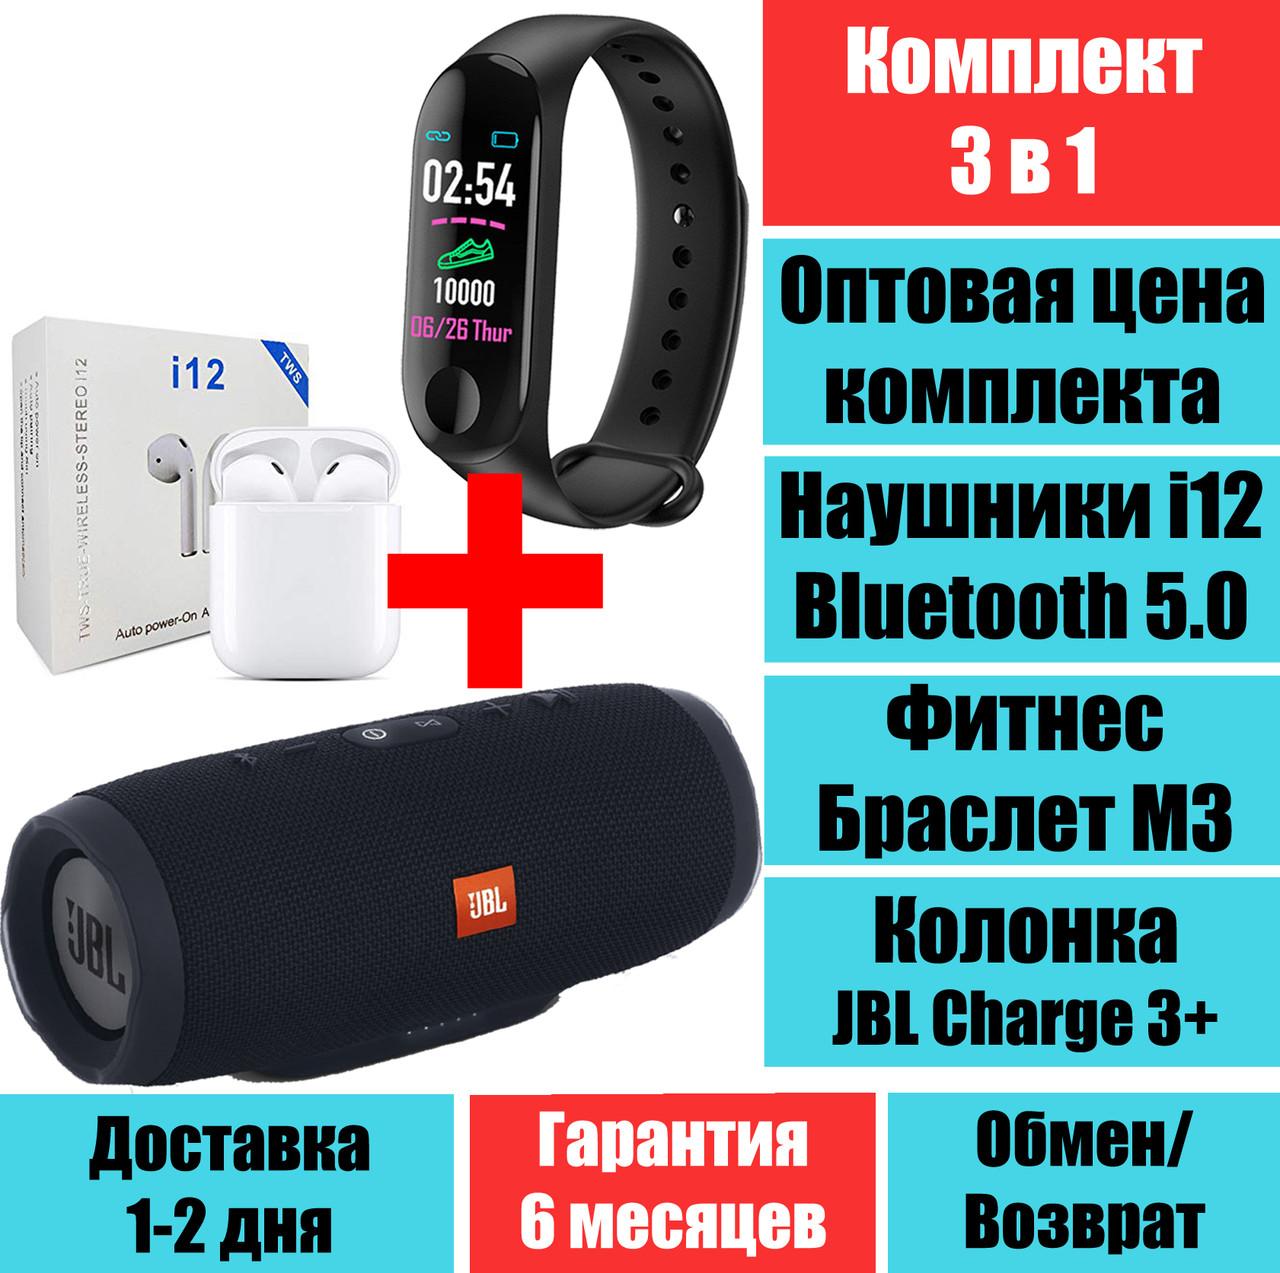 Колонка JBL Charge 3+ Черный, Фитнес браслет M3, наушники блютус i12 Mini Bluetooth Комплект QualitiReplica